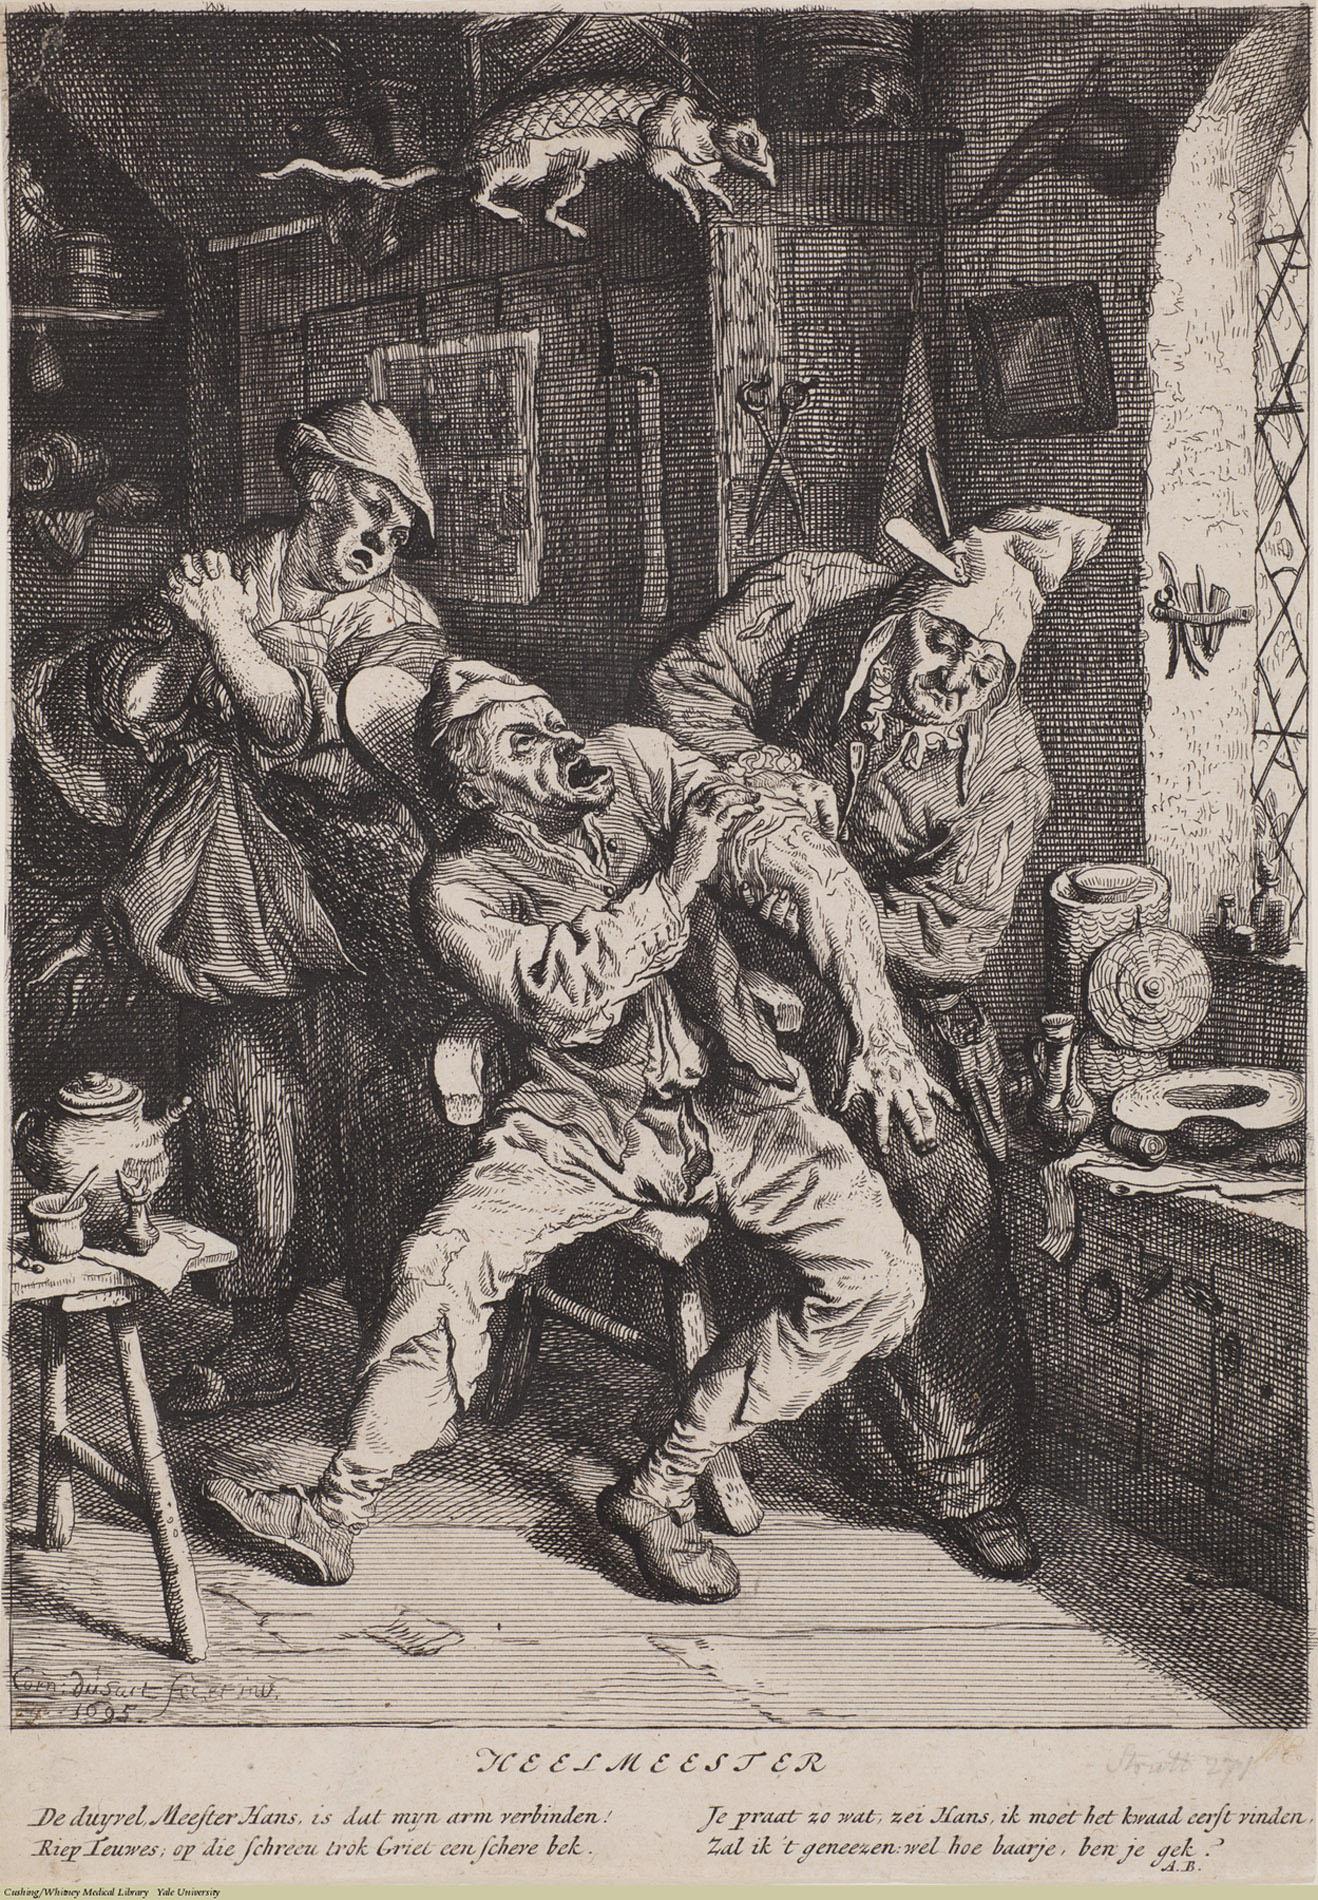 Heelmeester. Cornelius Dusart, Laid, 1695. Subject: Barber Surgeons, Rural Medicine.